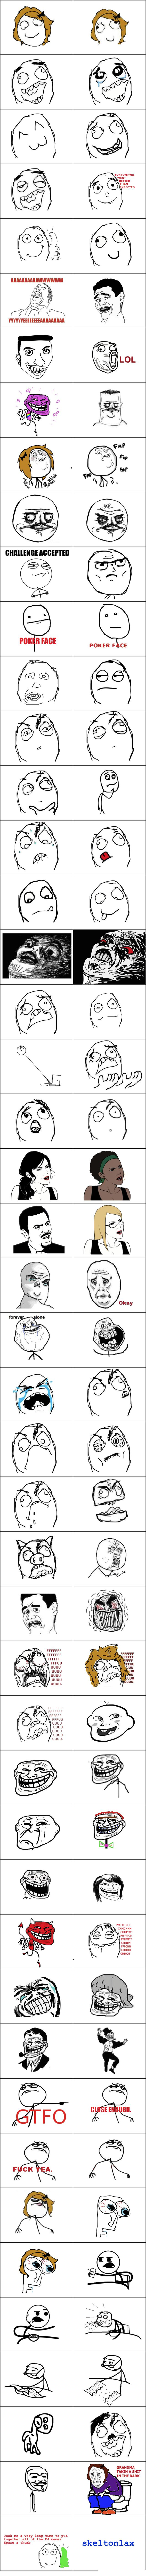 All meme faces. u mad?.. Upload all the memes